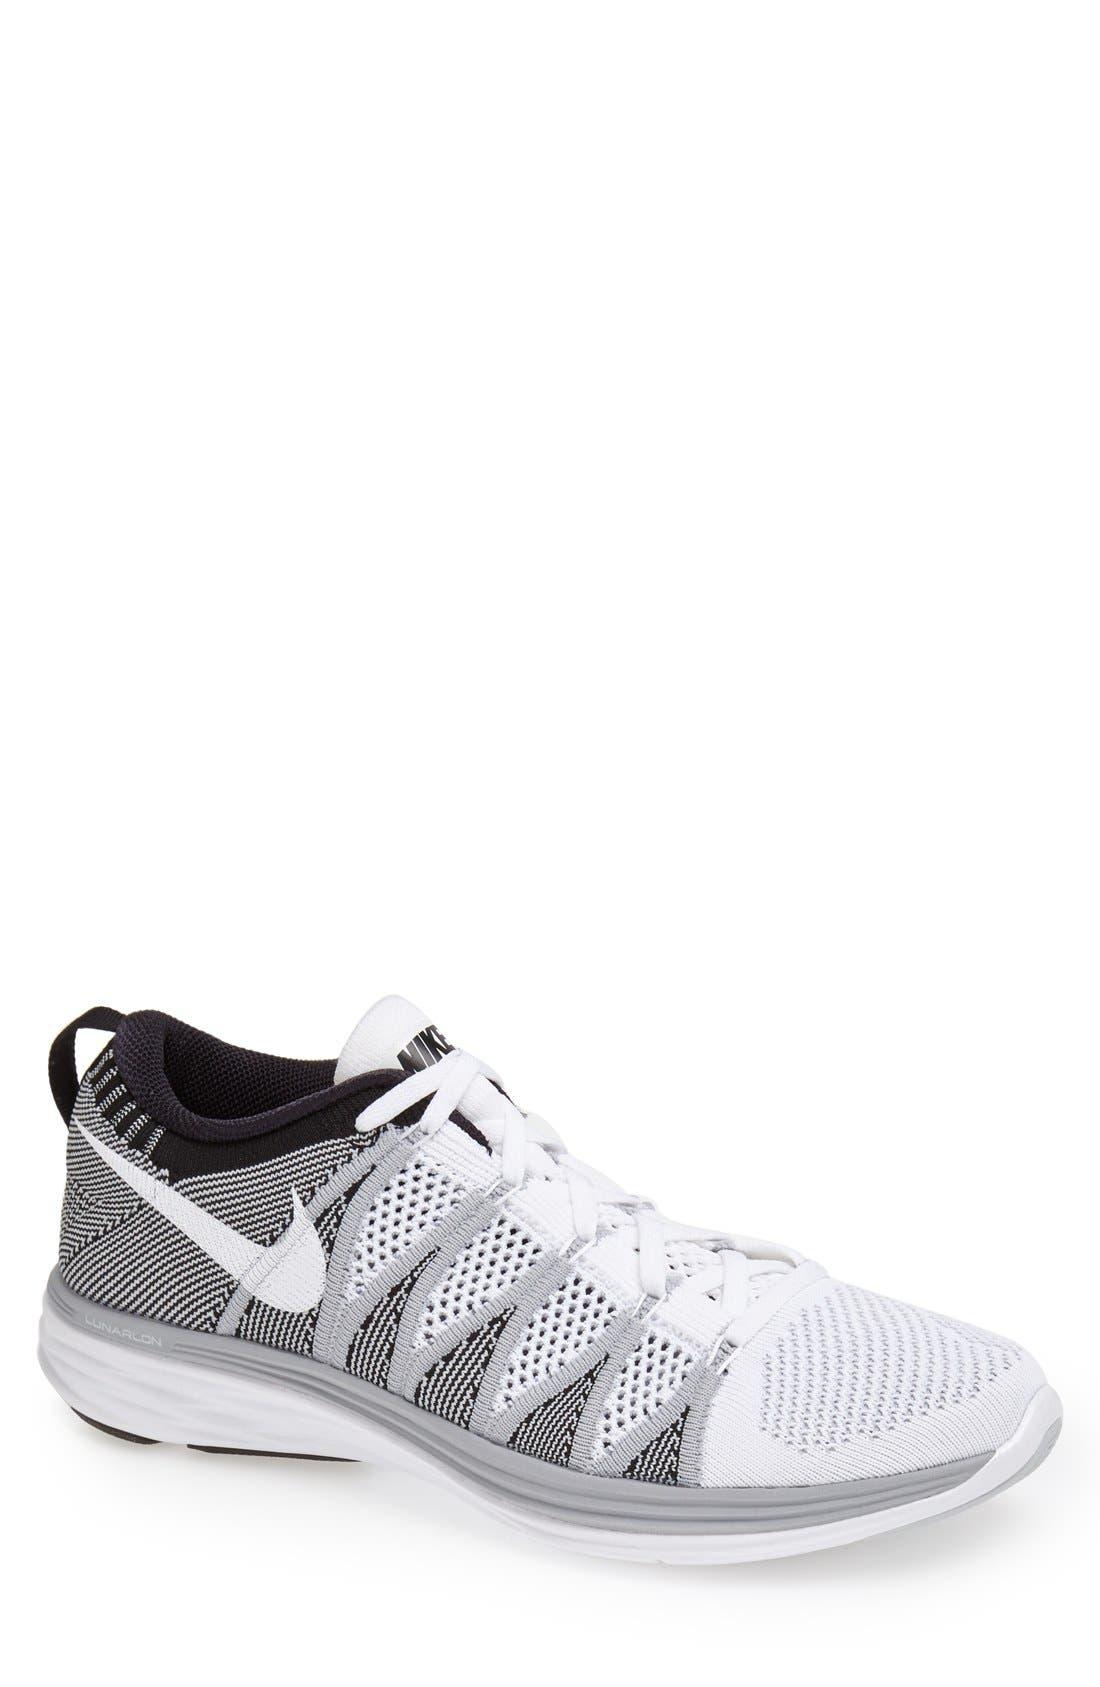 Main Image - Nike 'Flyknit Lunar2' Running Shoe (Men)